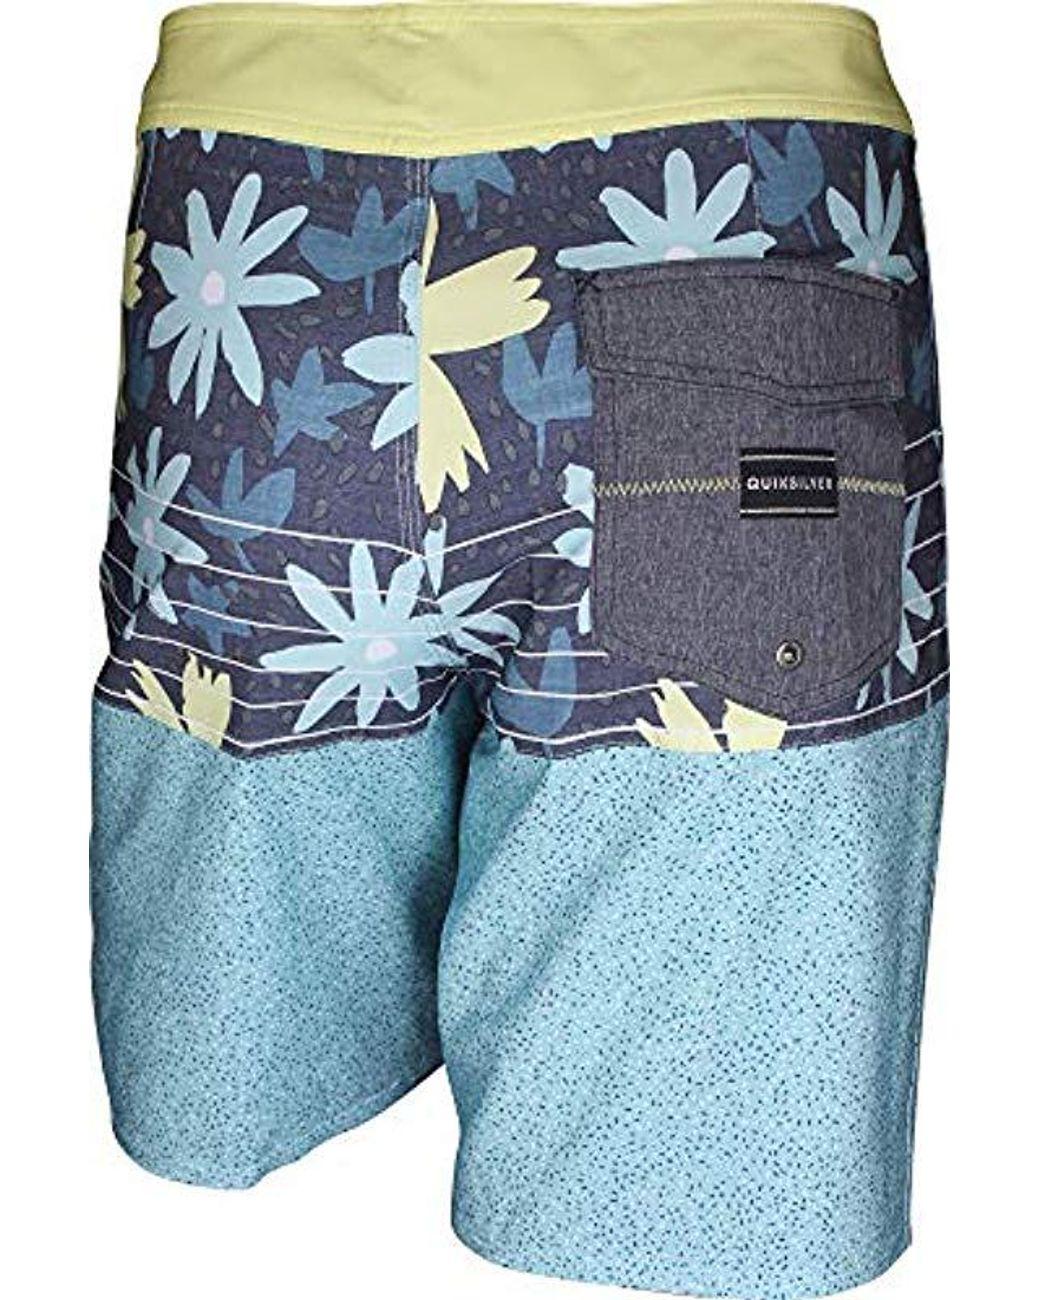 349tg1u Gentlemanly Attire On Wheat Small Fabric Mens Swim Trunks Shorts Athletic Swimwear Briefs Boardshorts